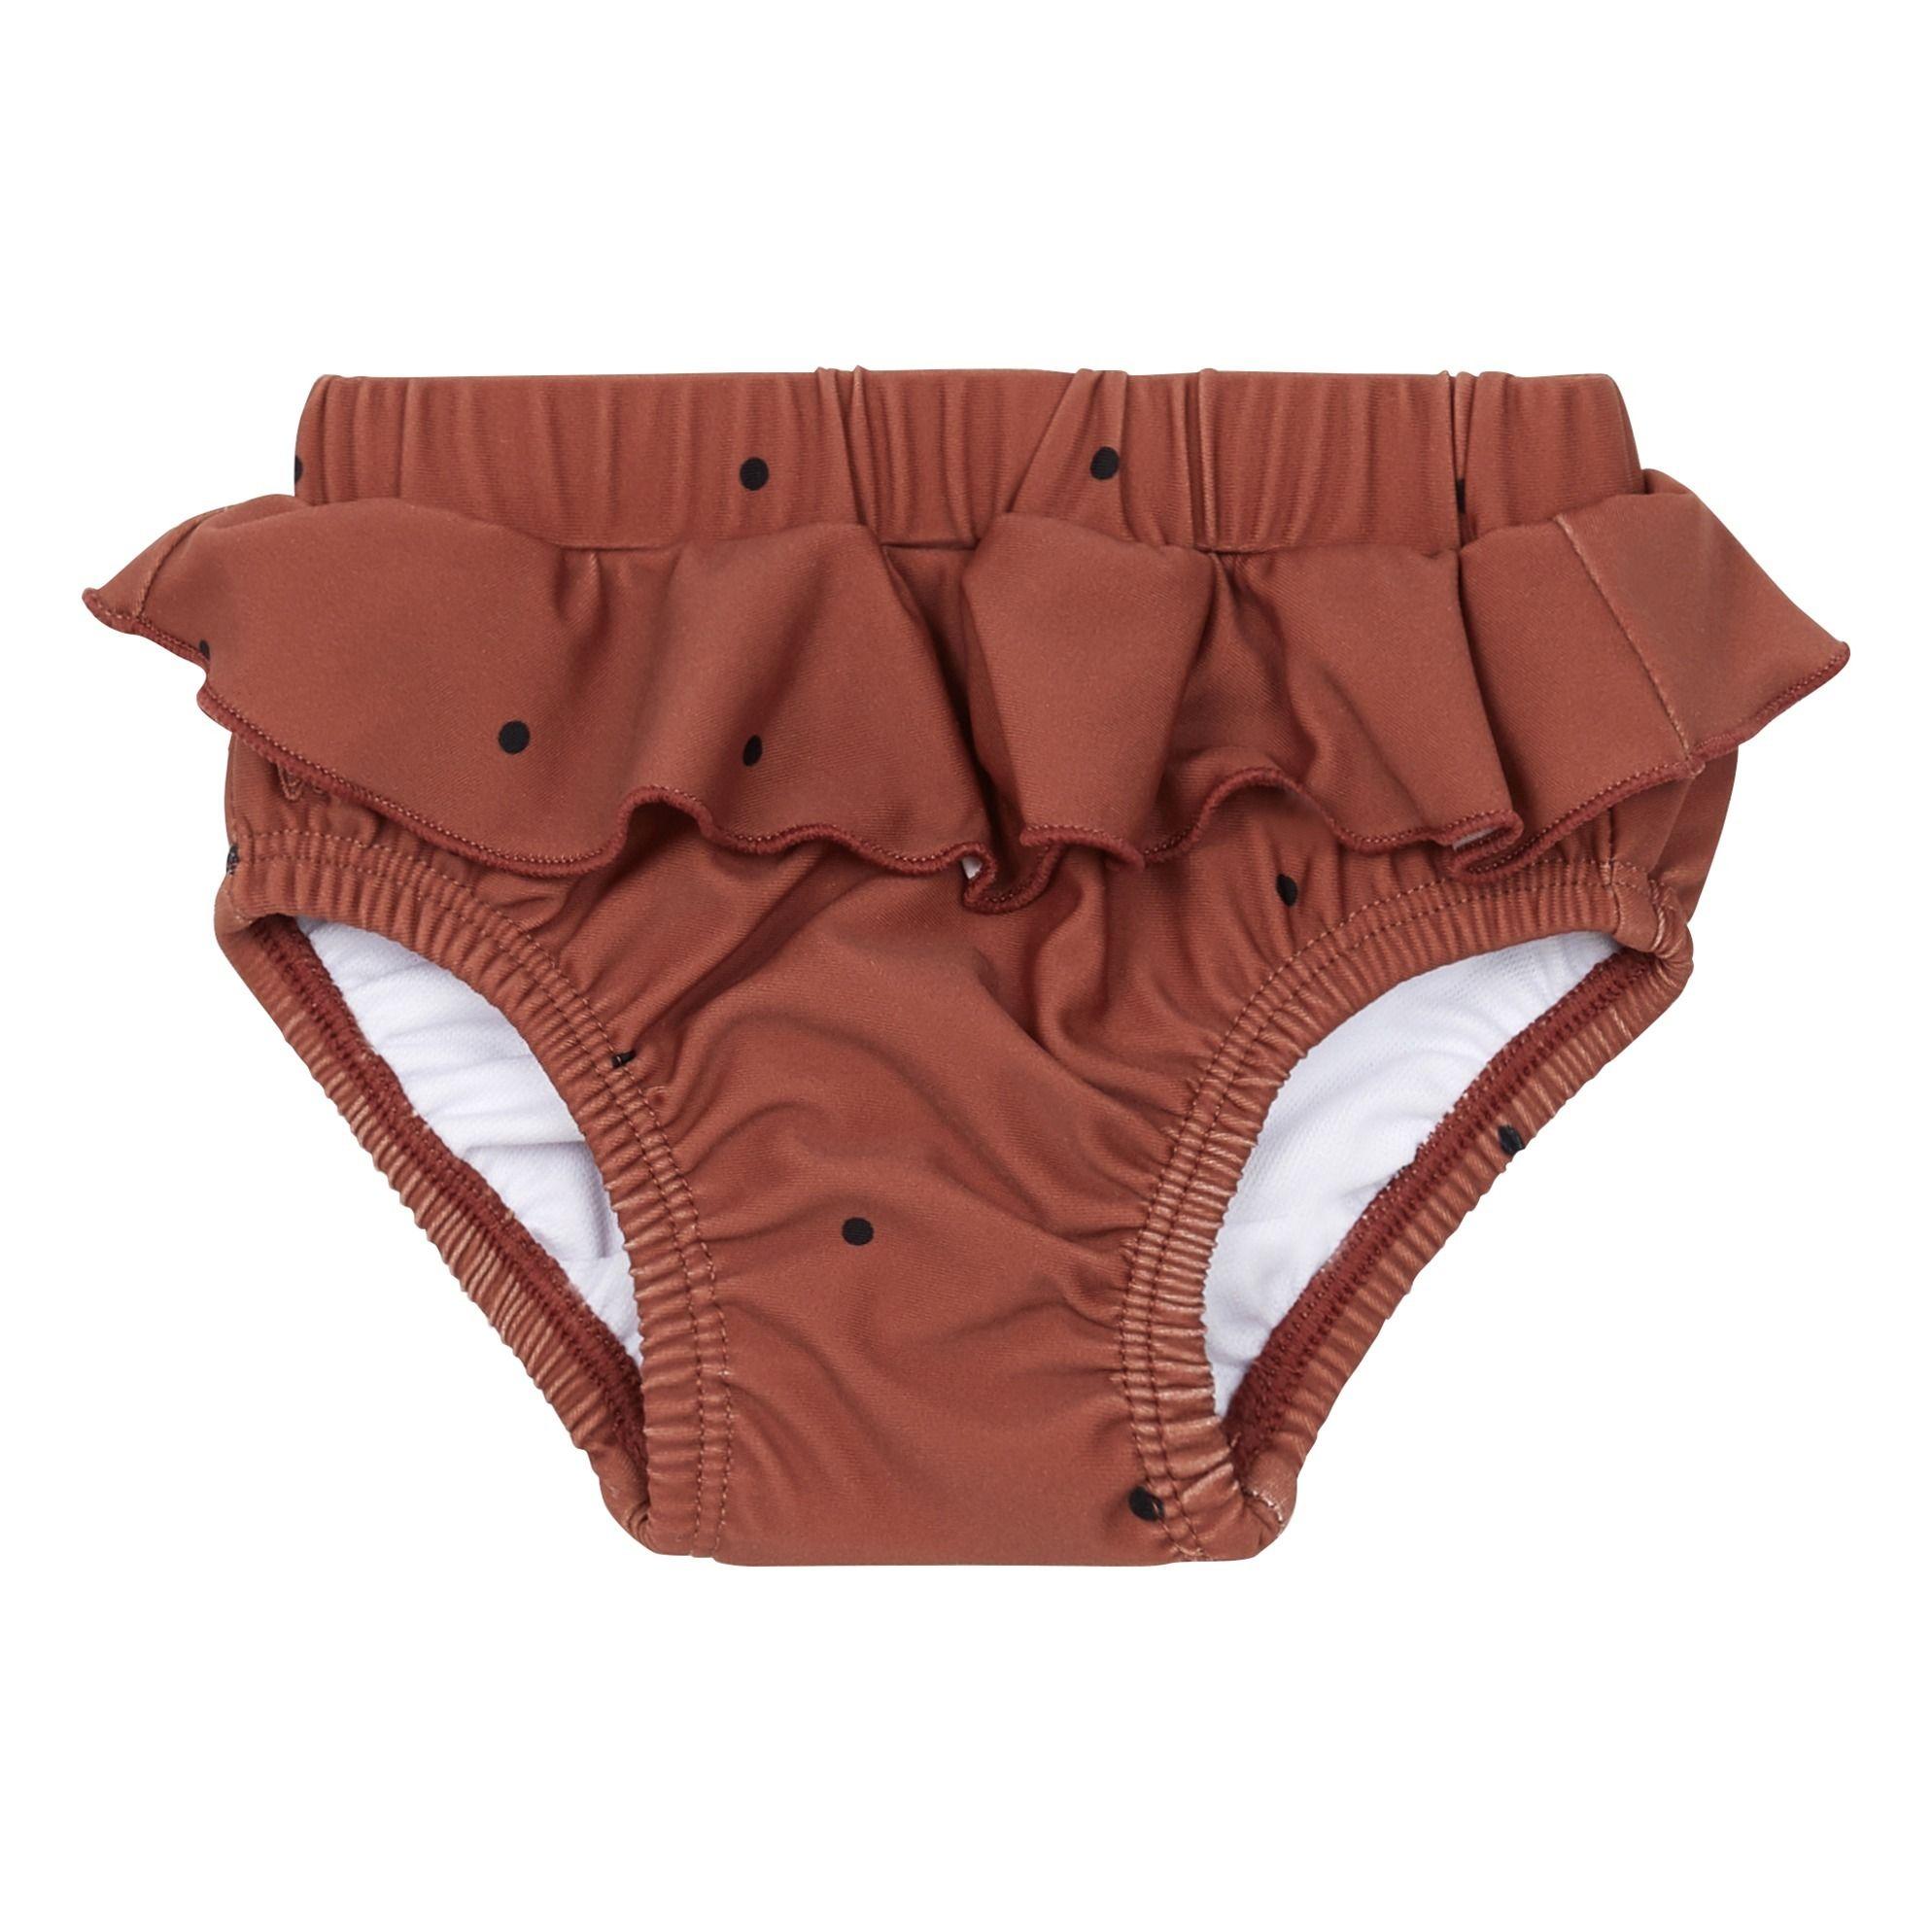 5c0ad7c14d Elise swimming bottoms Red | Swim | Swimming, Fashion, Swimwear